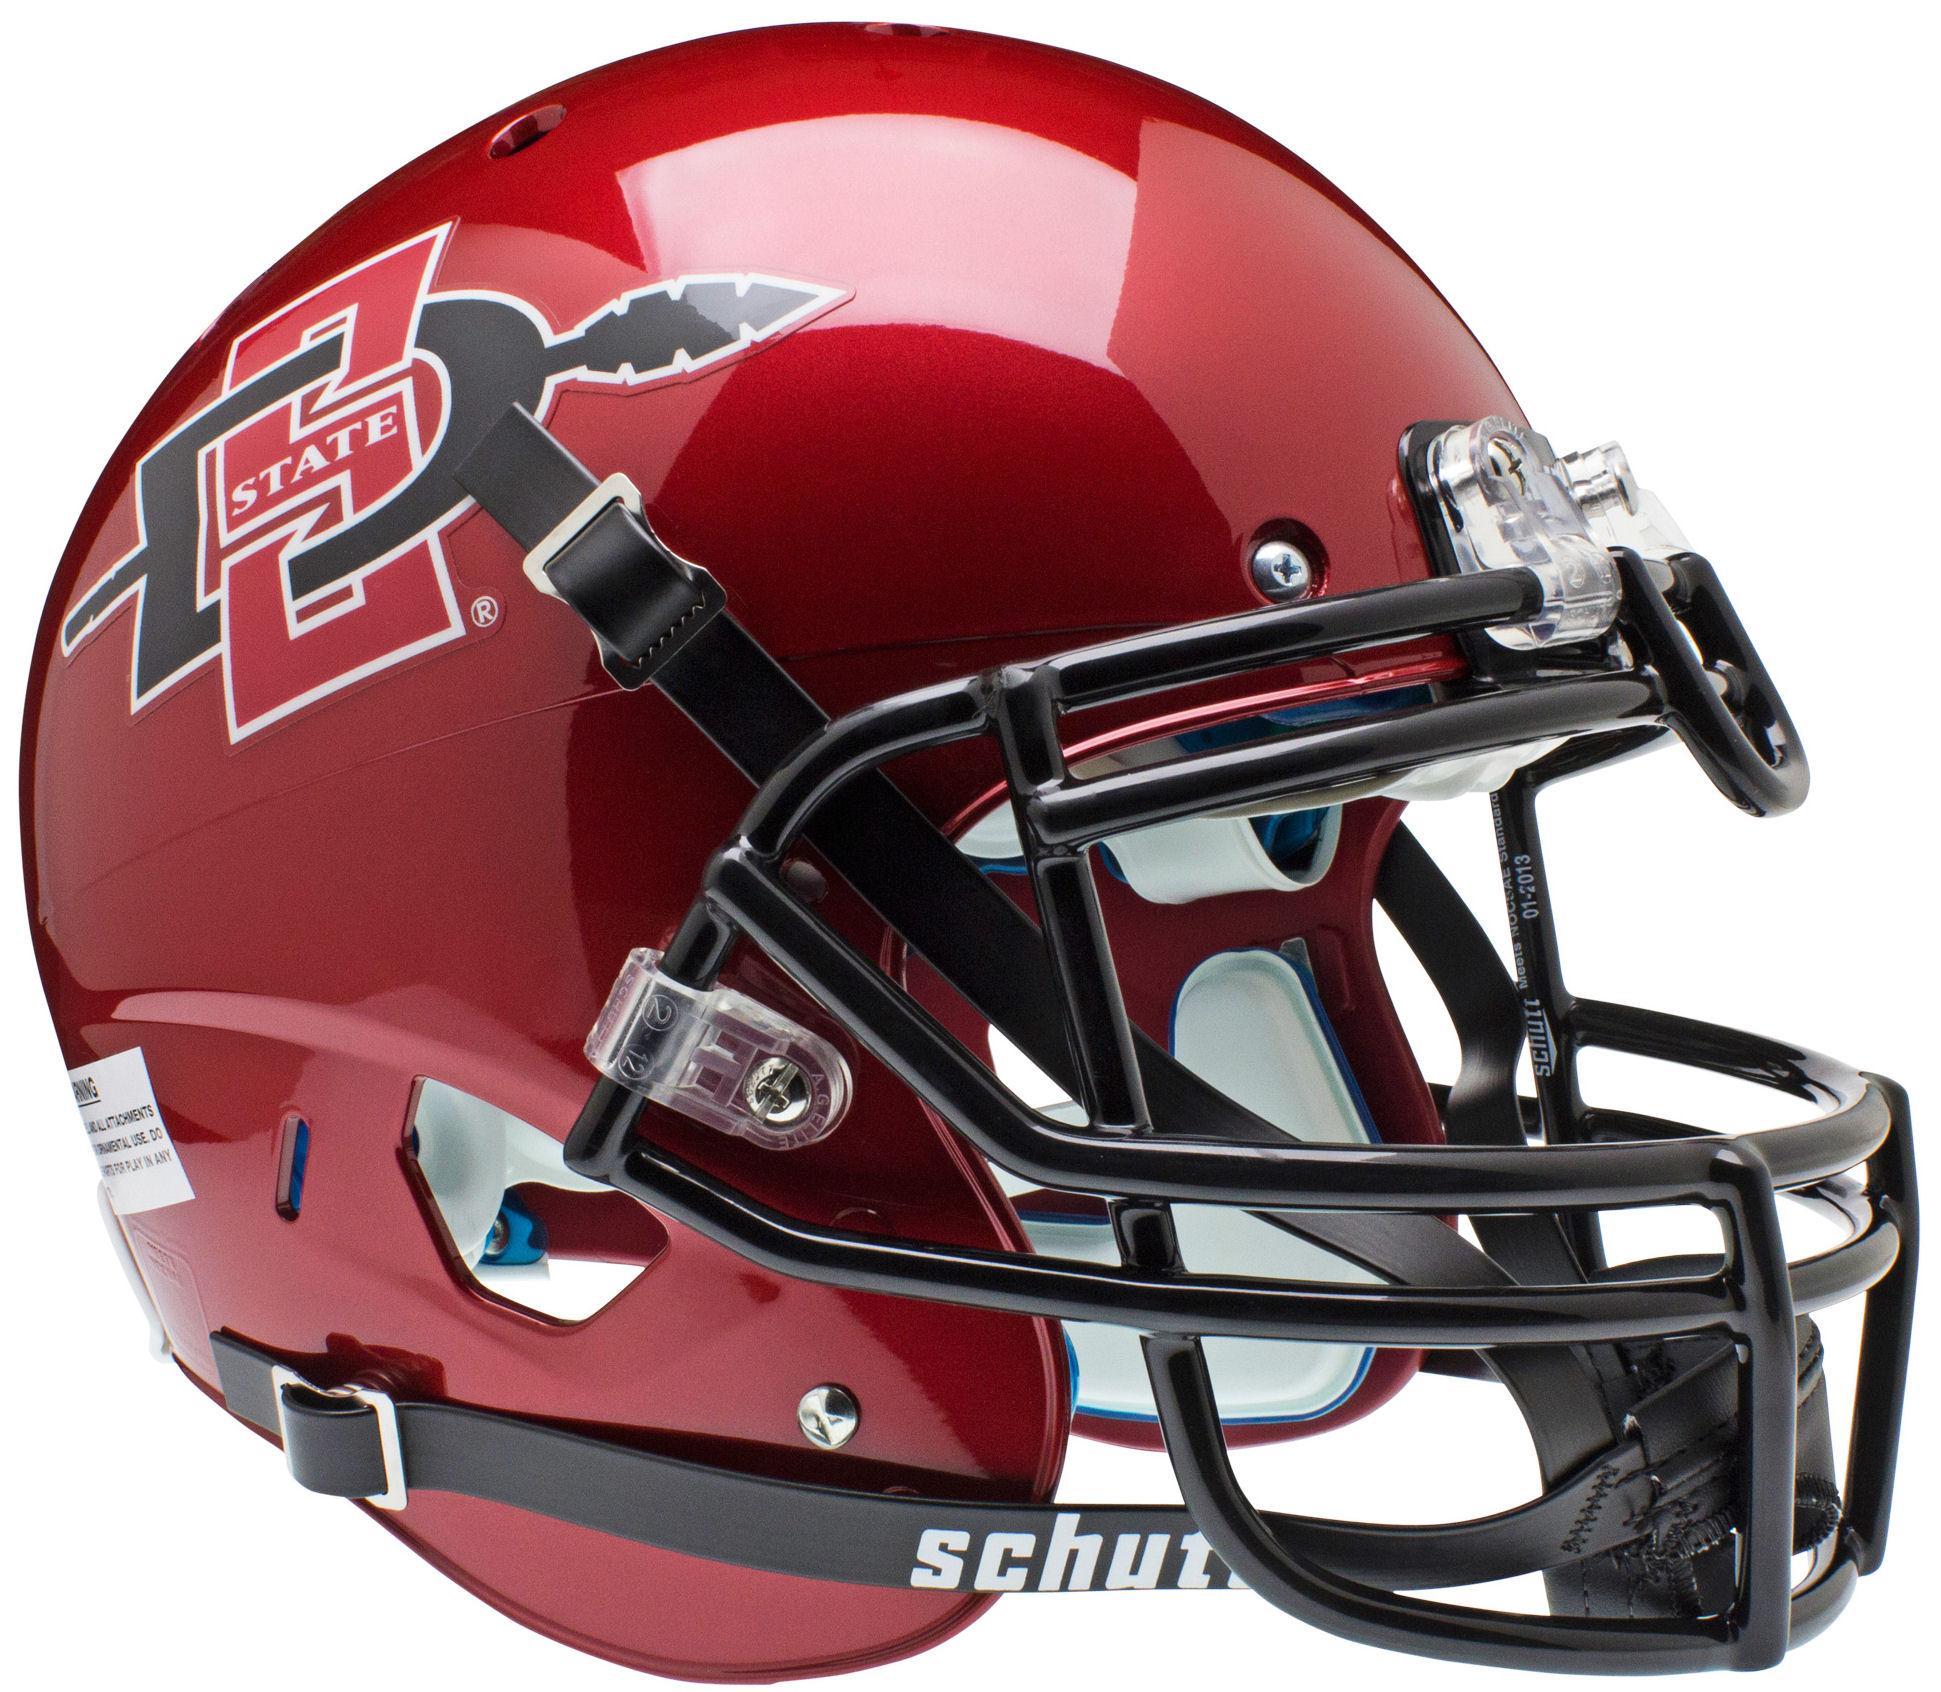 San Diego State Aztecs Authentic College XP Football Helmet Schutt